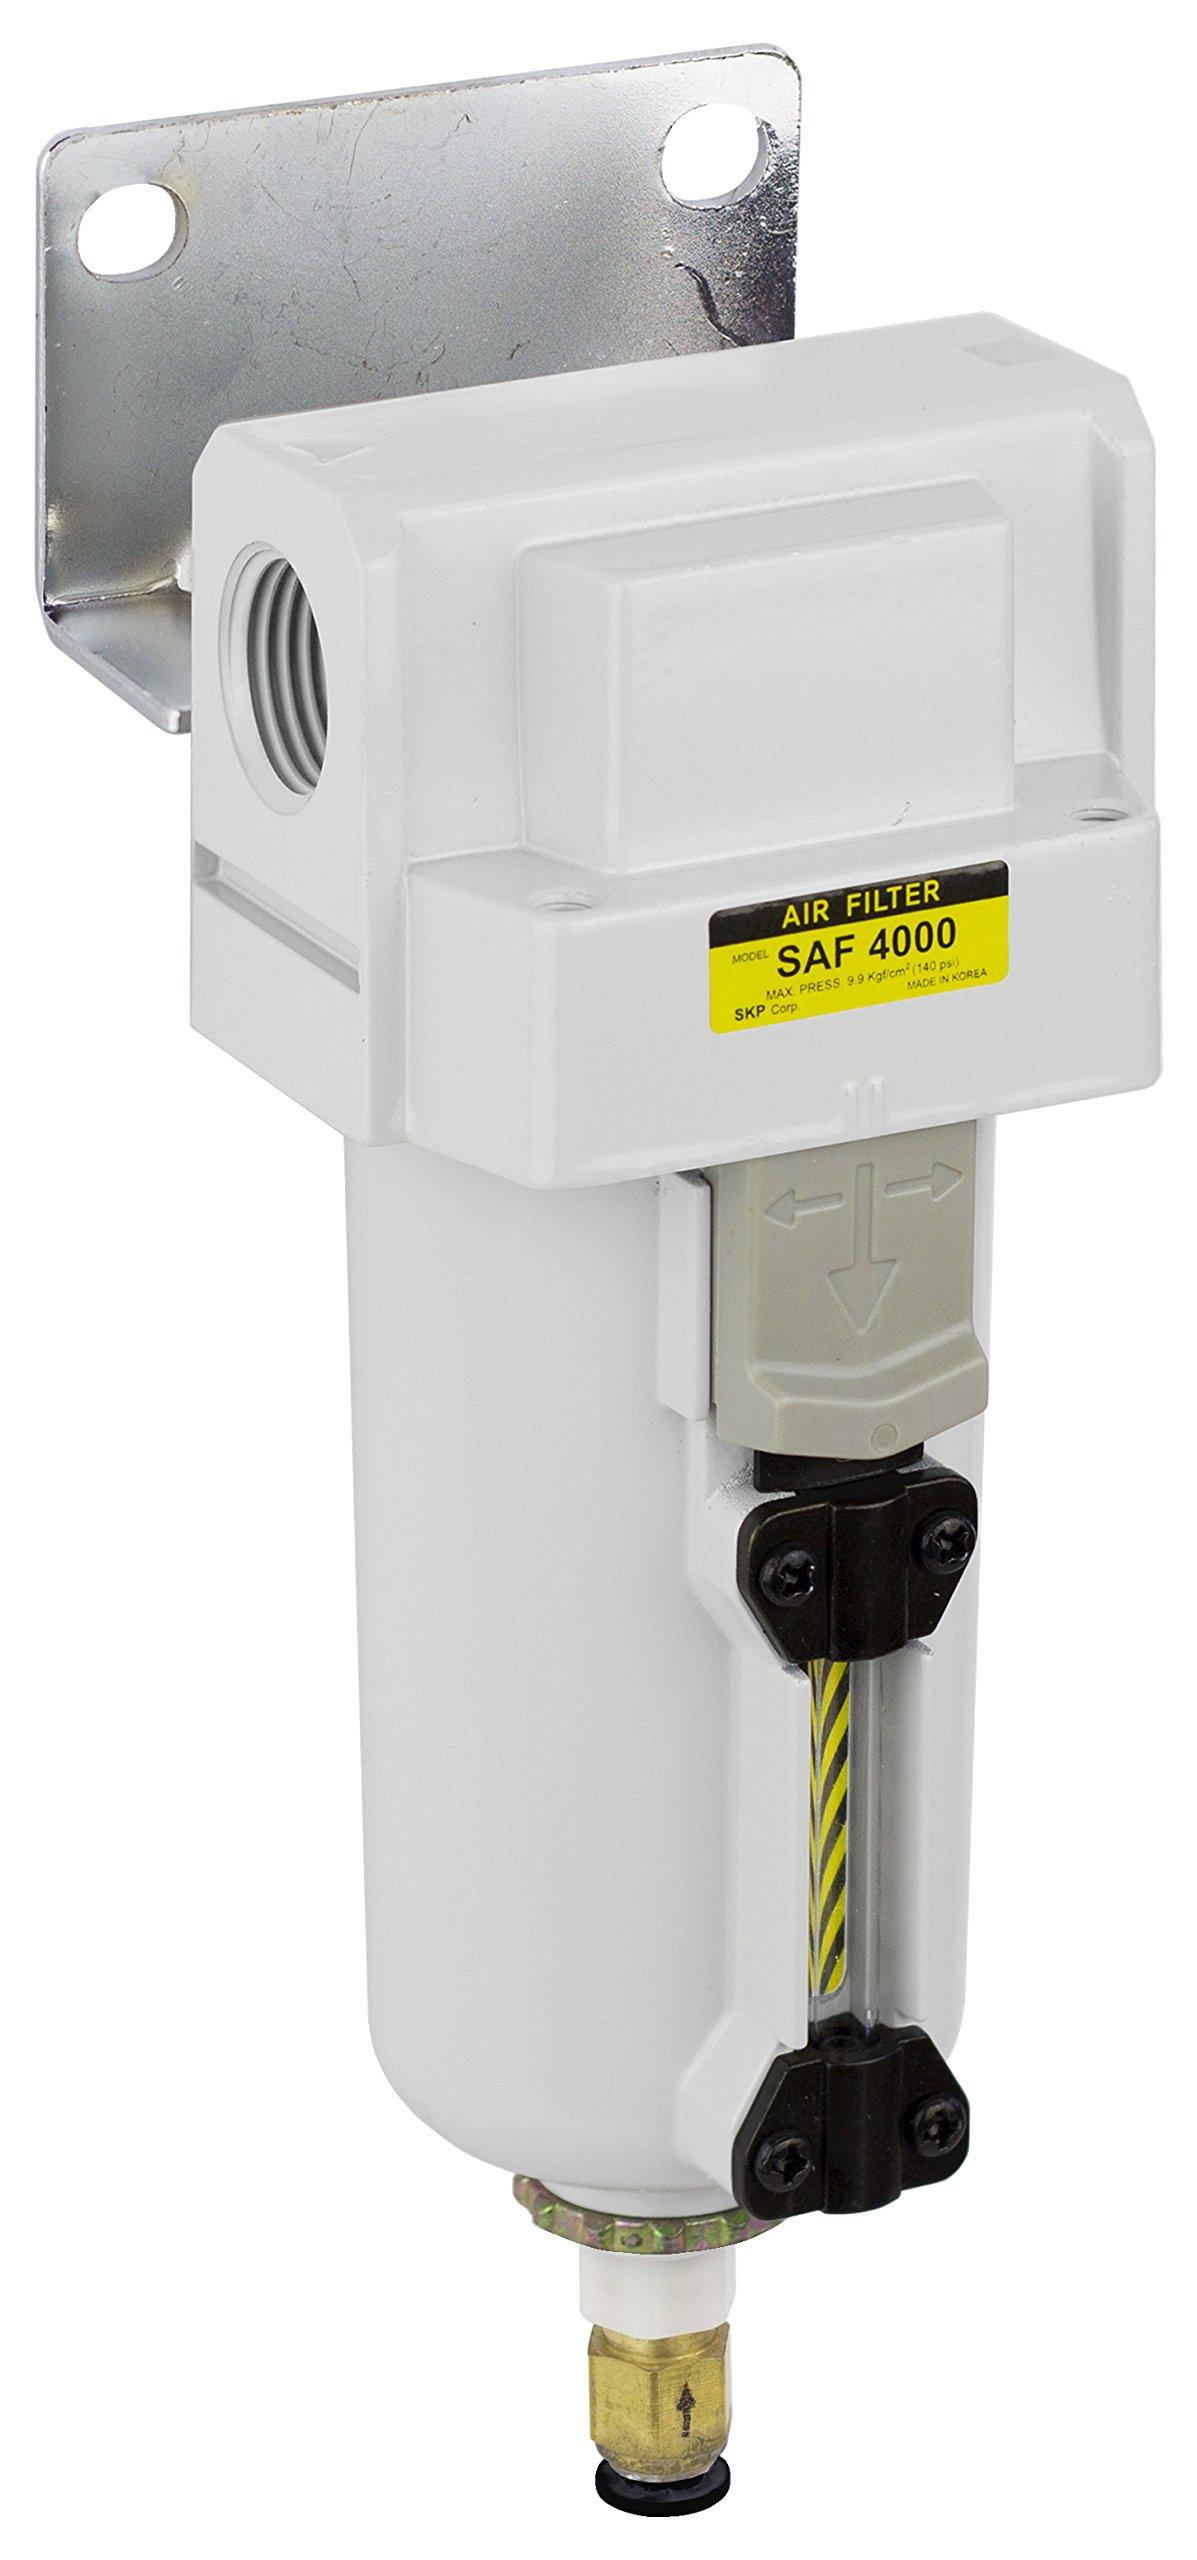 PneumaticPlus SAF4000M-N04BD-MEP Compressed Air Particulate Filter, 1/2'' NPT, Auto Drain, Metal Bowl, 10 μm